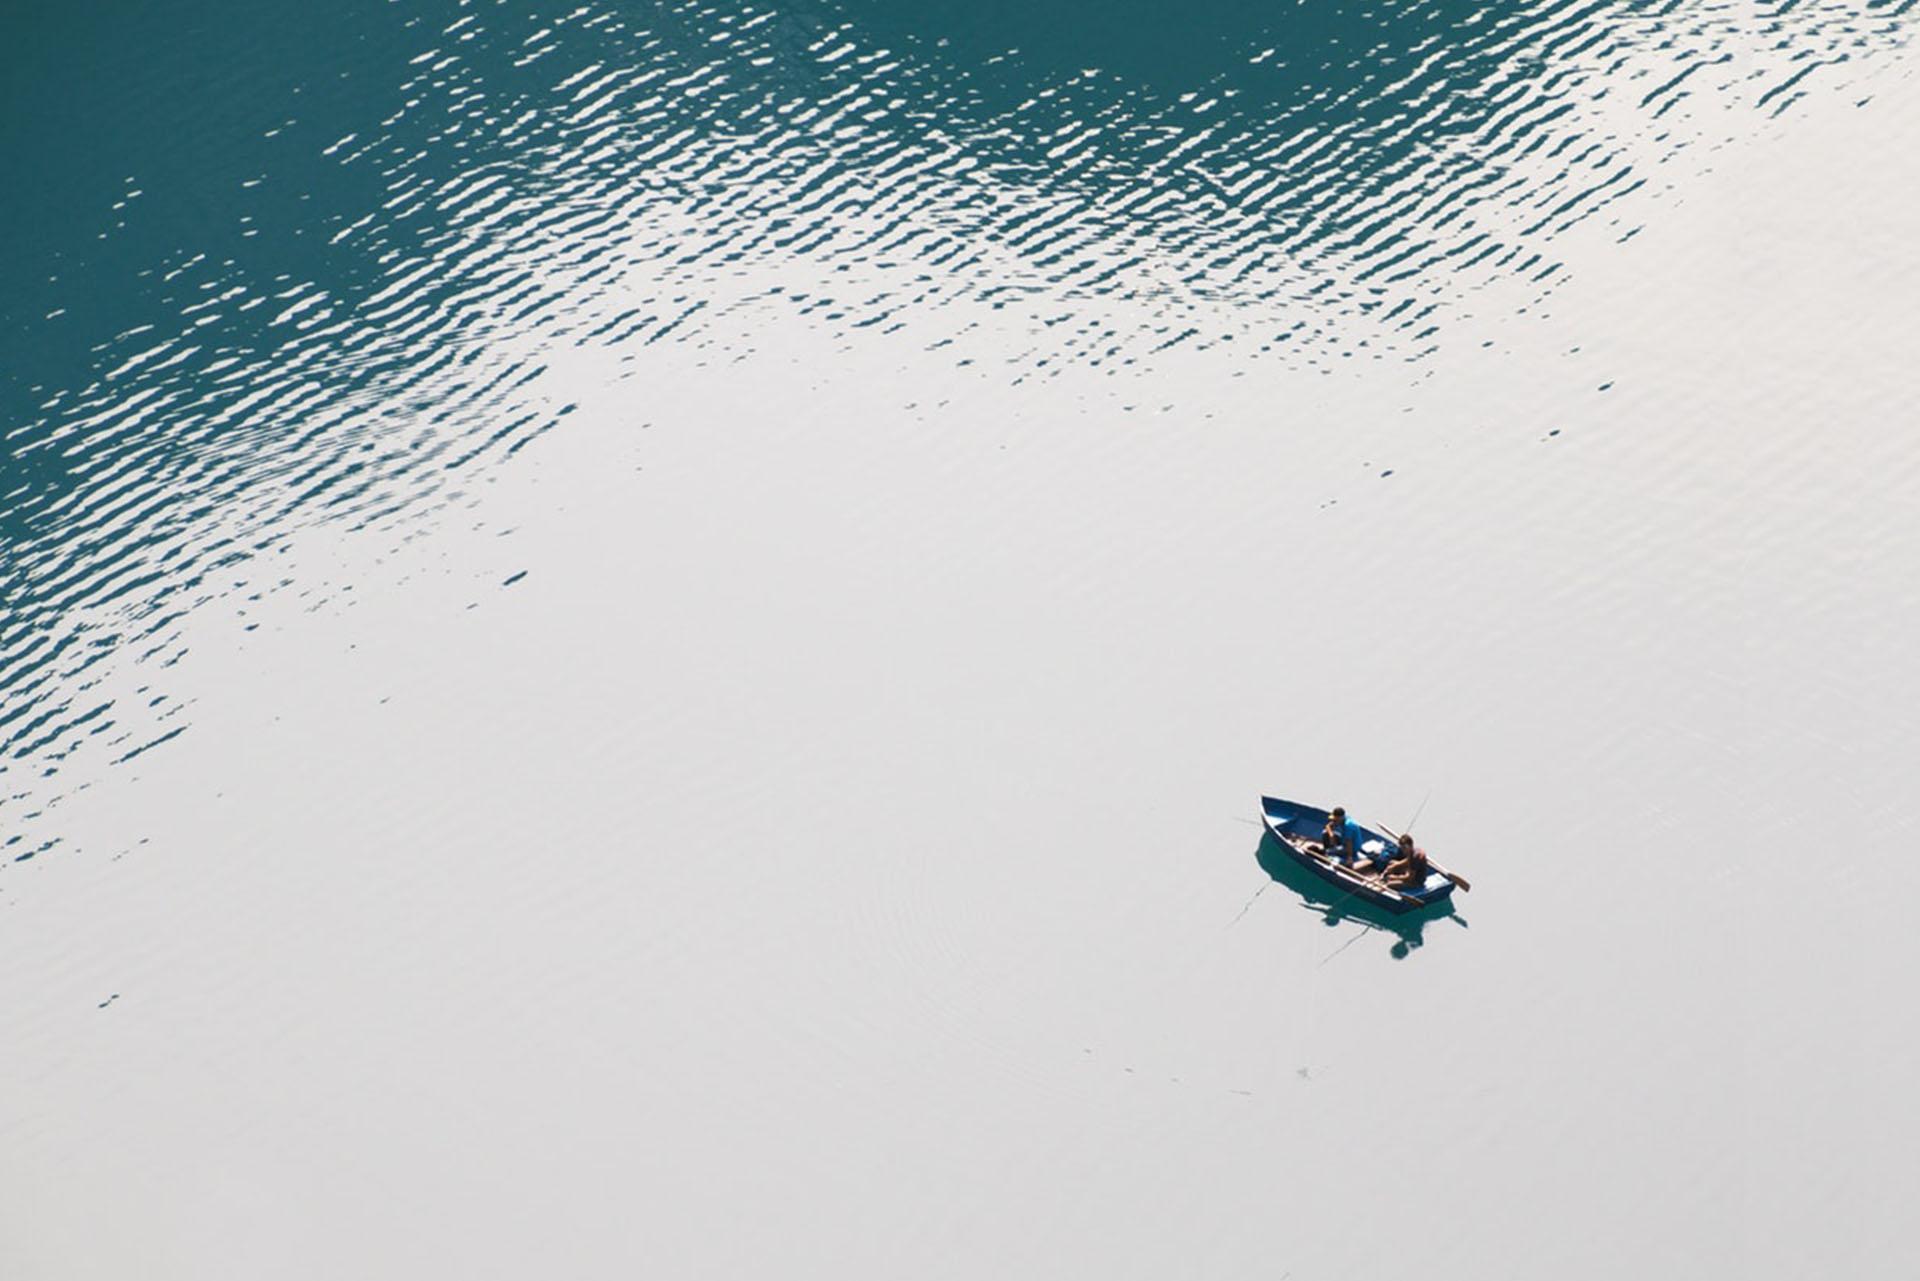 Kalau Kail Panjang Sejengkal Jangan Lautan Hendak Diduga